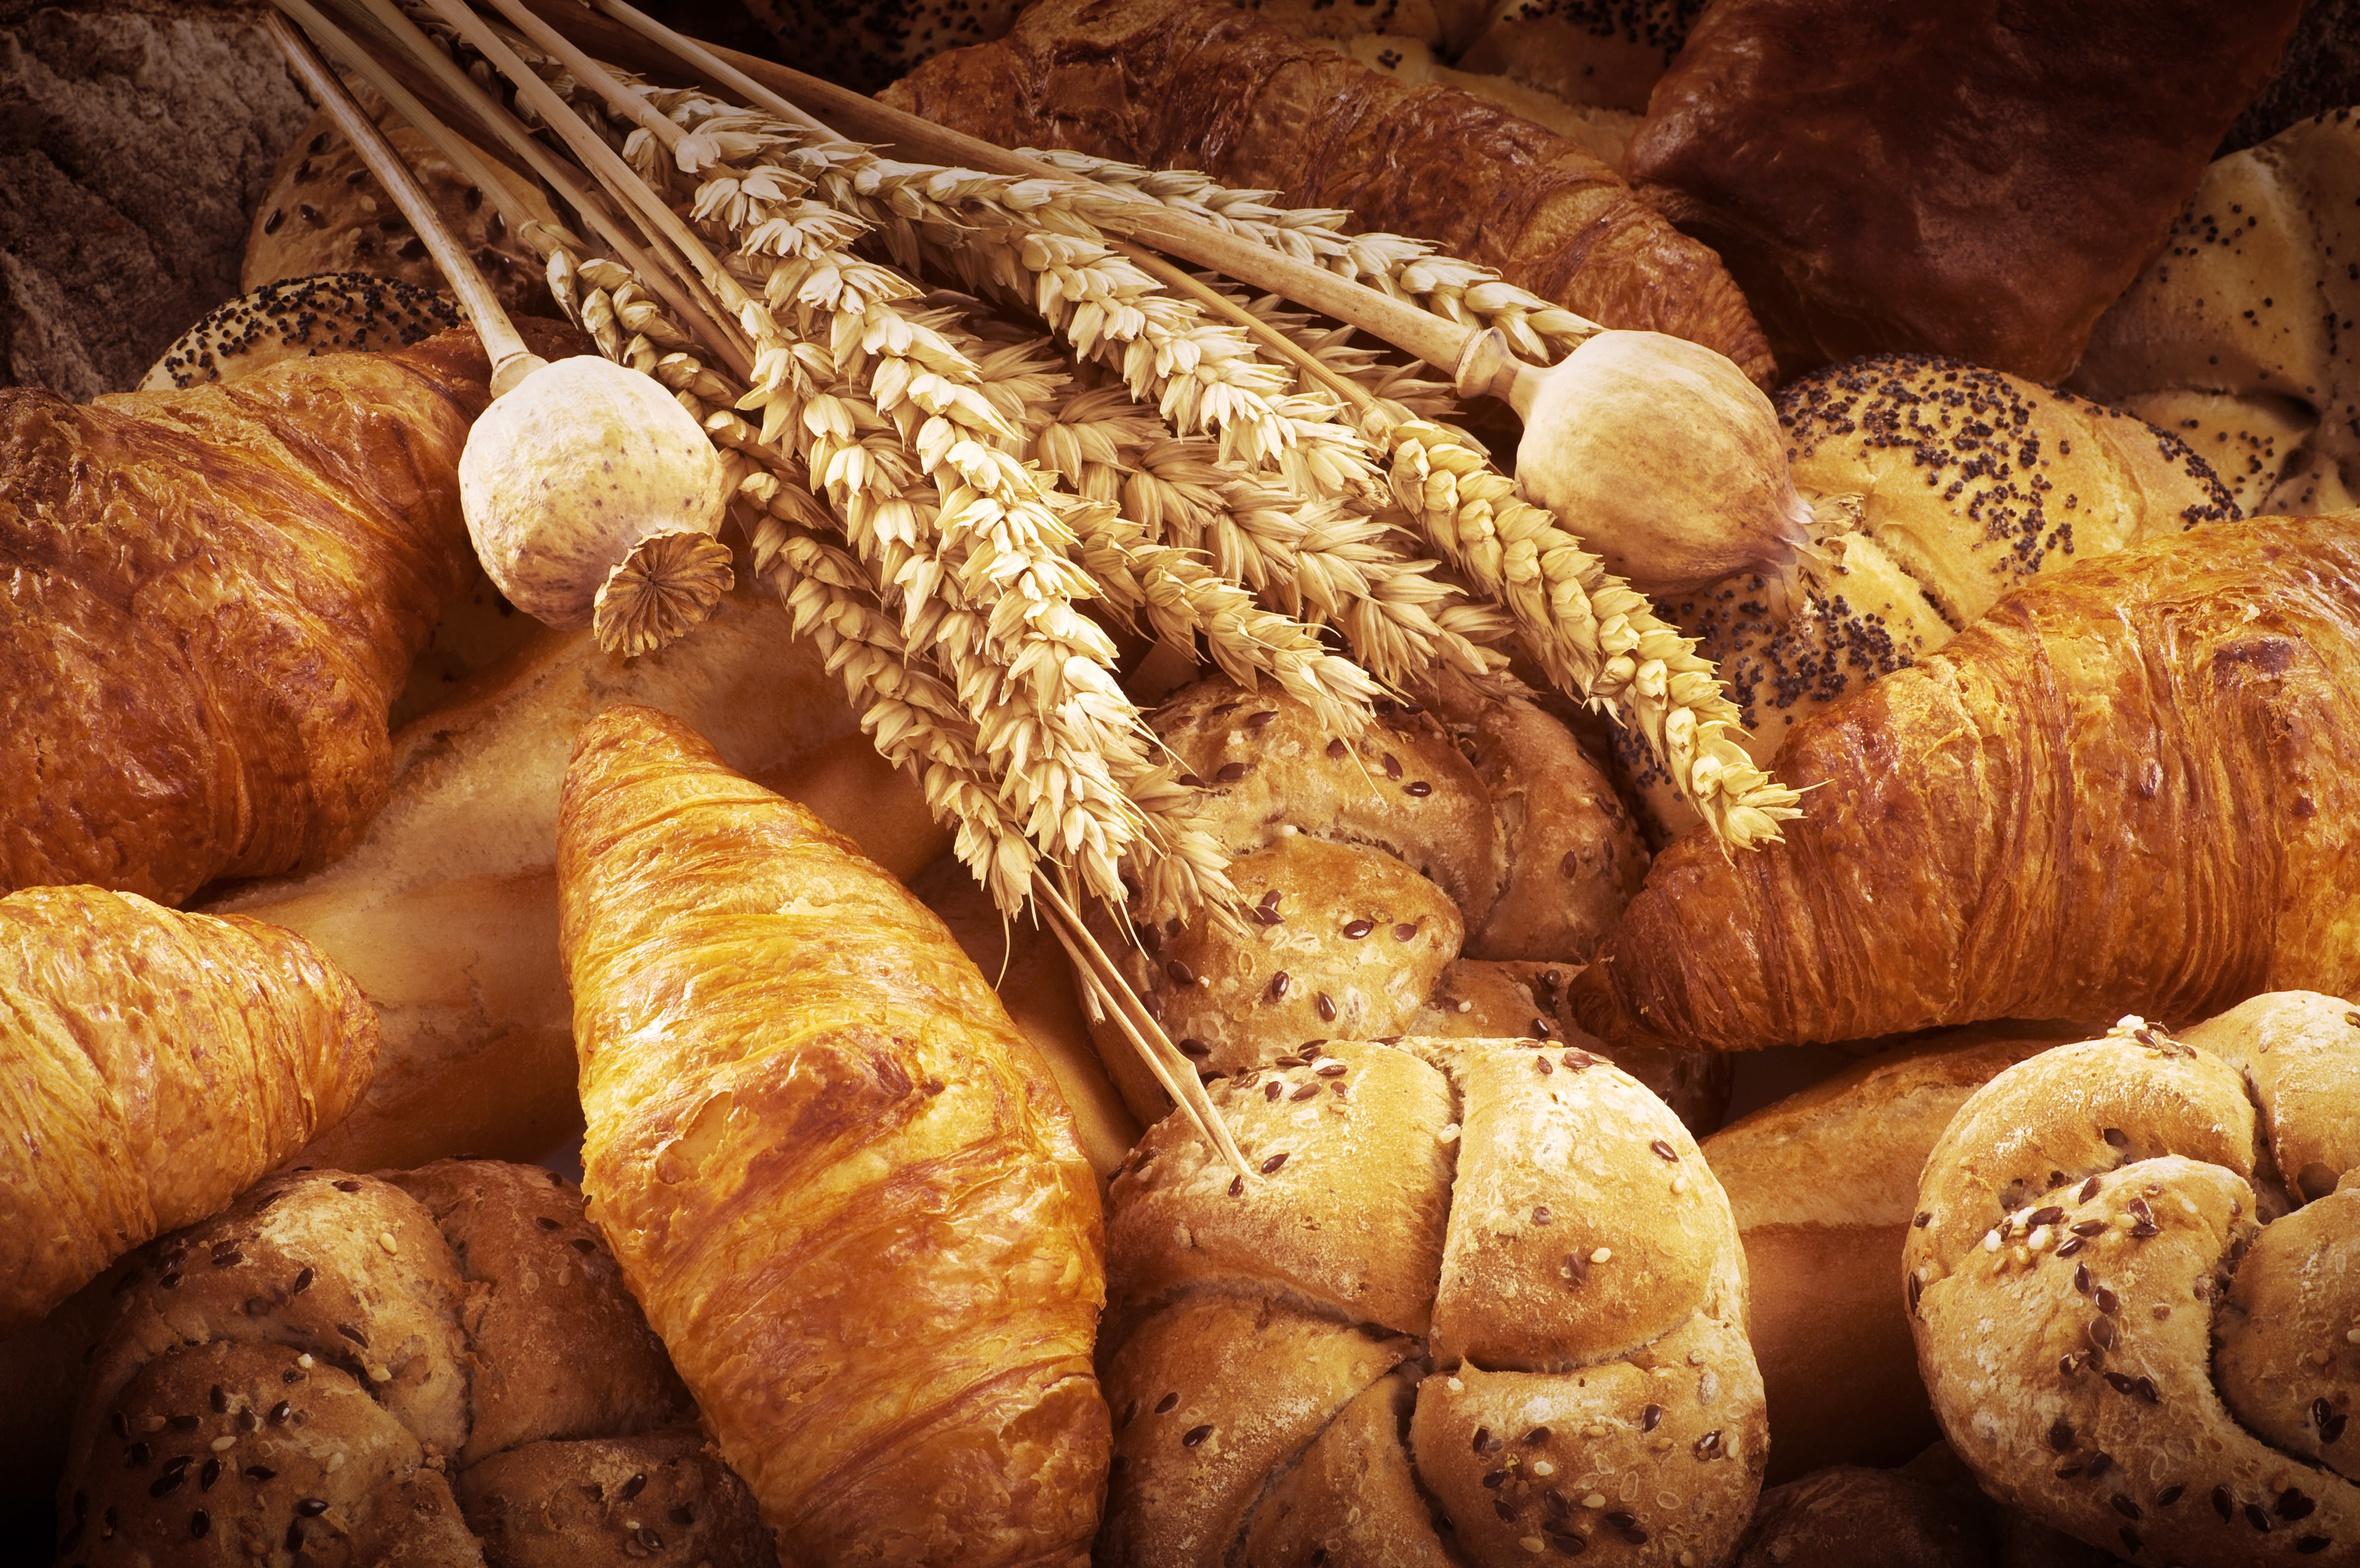 картинки большого хлебокомбинат образом